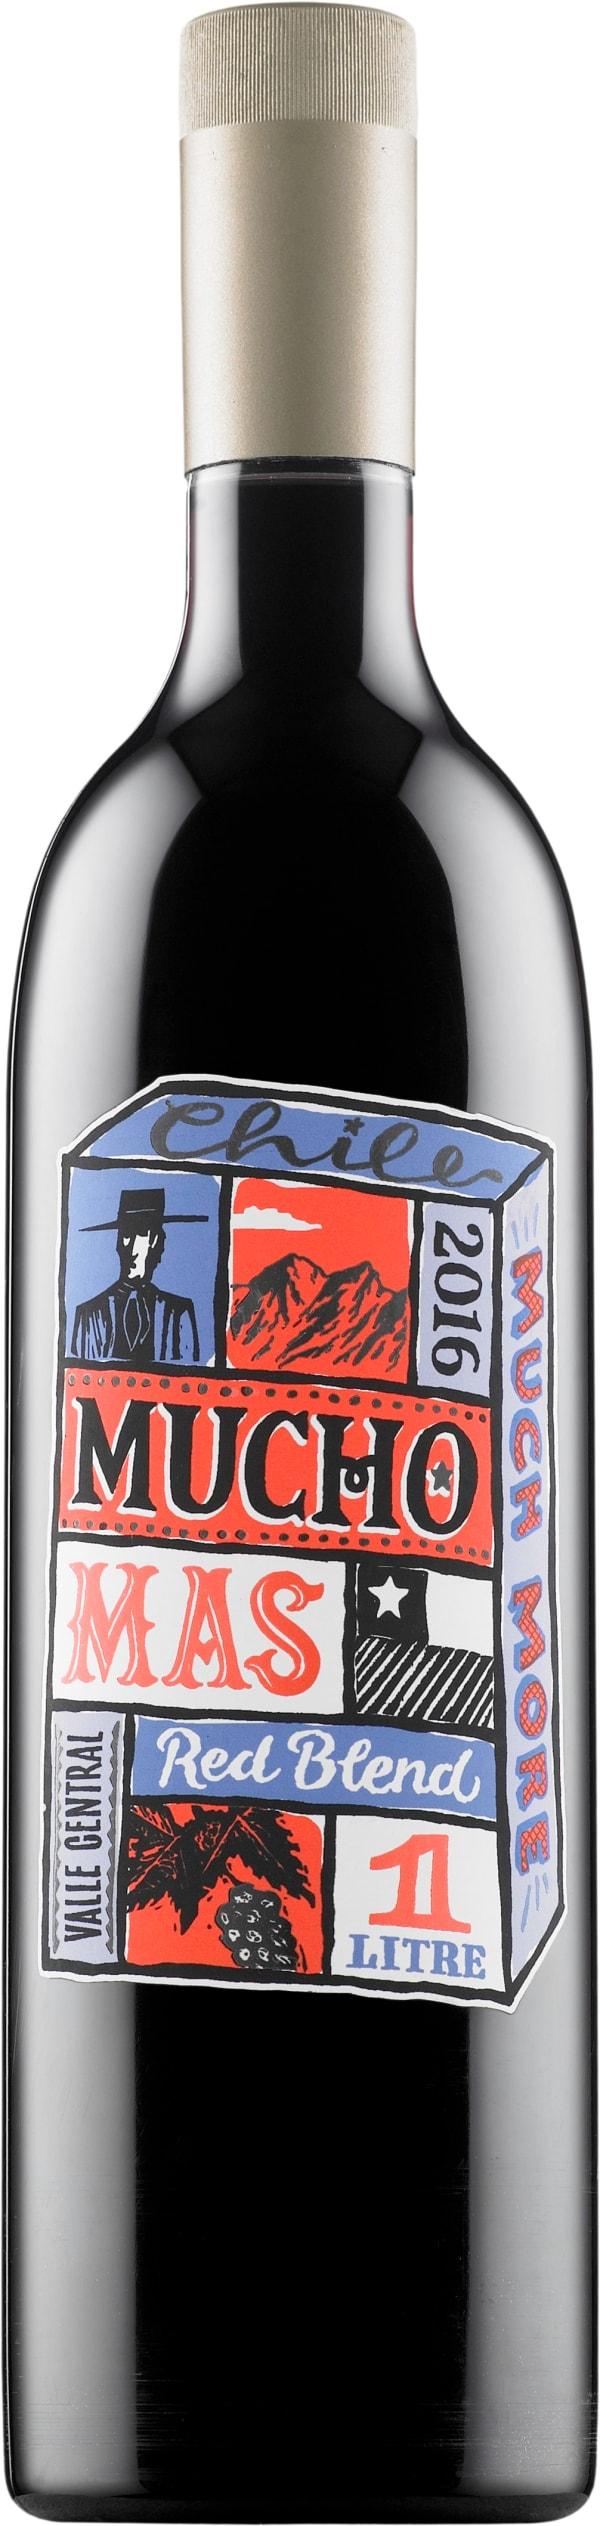 Mucho Mas Red Blend 2017 muovipullo